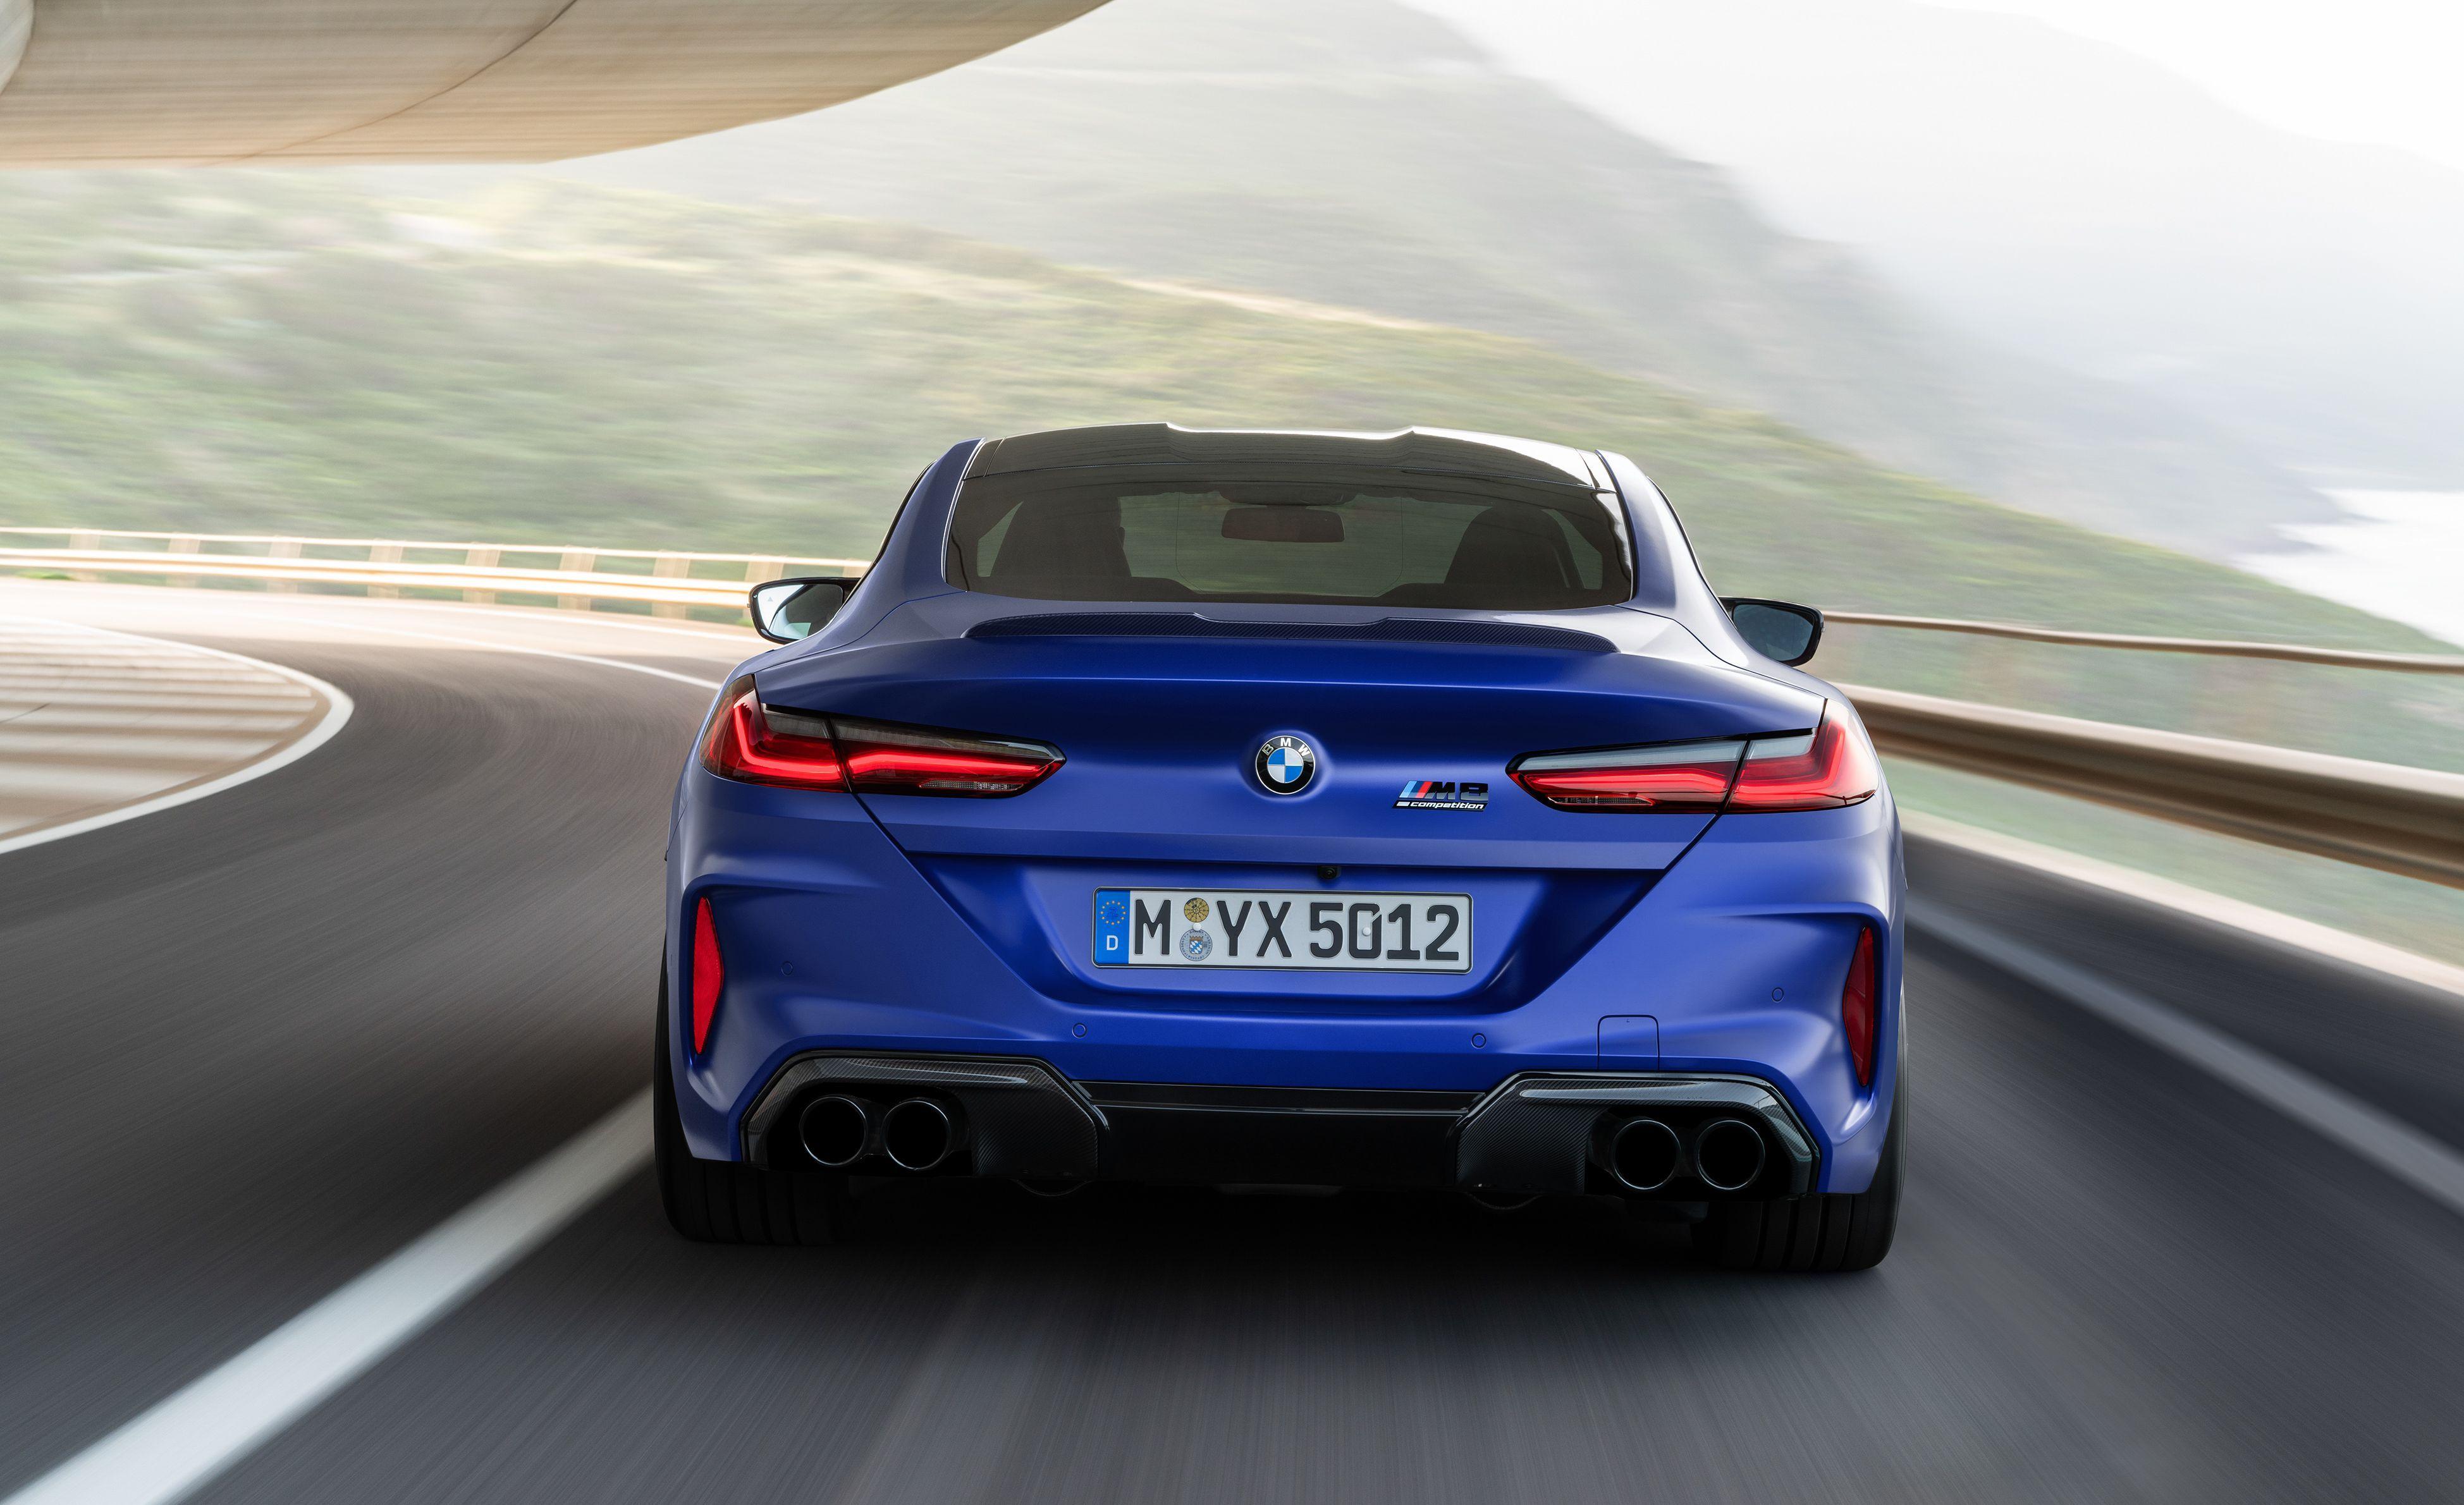 BMW 가장 강력한 2020 BMW M8 공개(2020 BMW M8 Debut) 자동차 및 빨간색